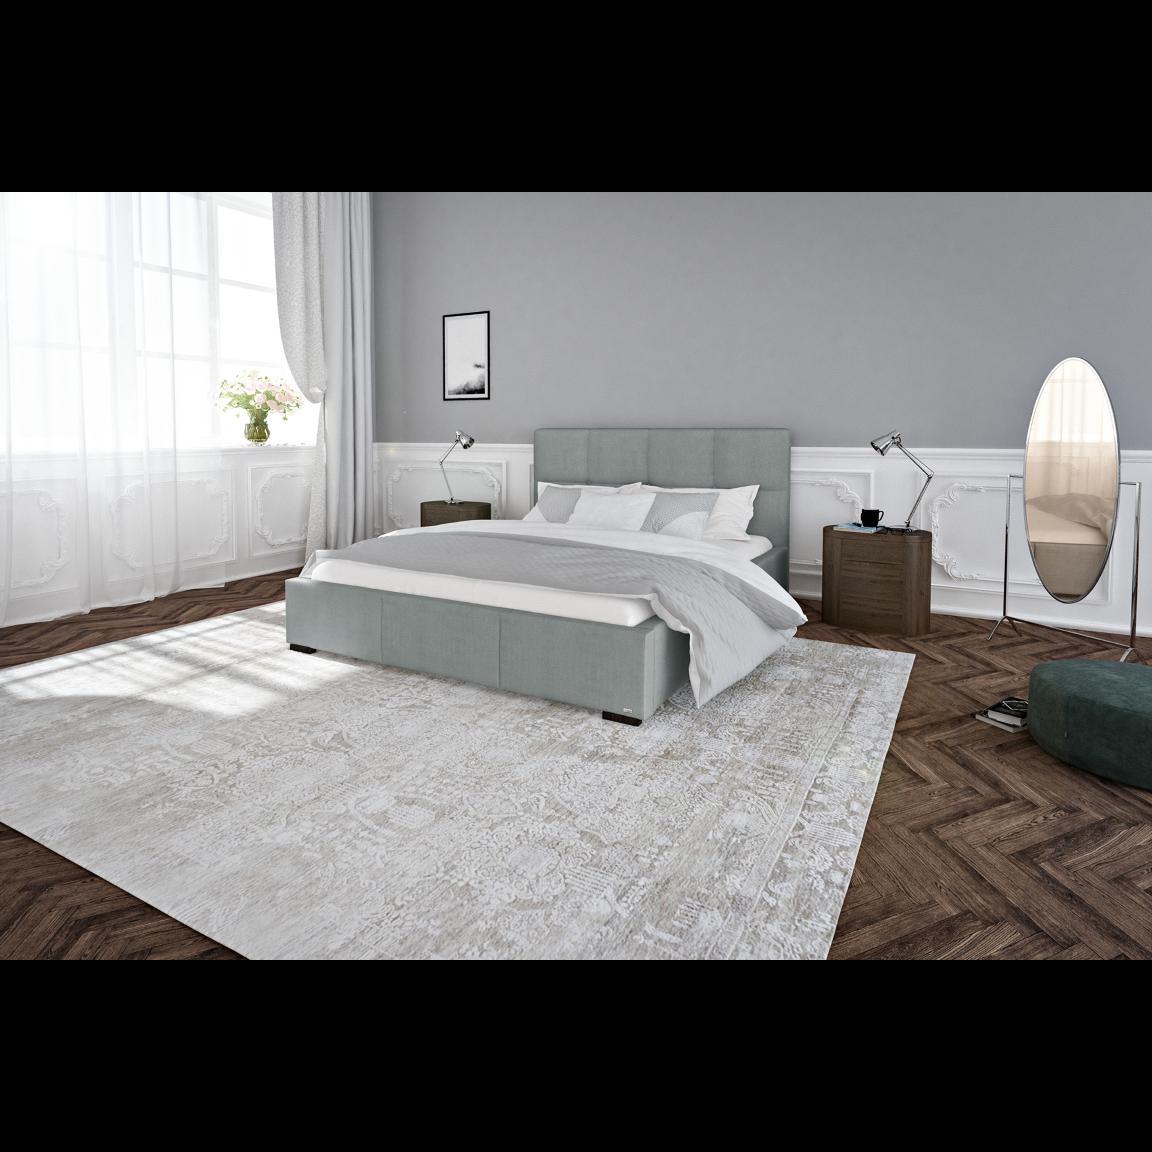 Bett Fascination | Grau-140 x 200 cm